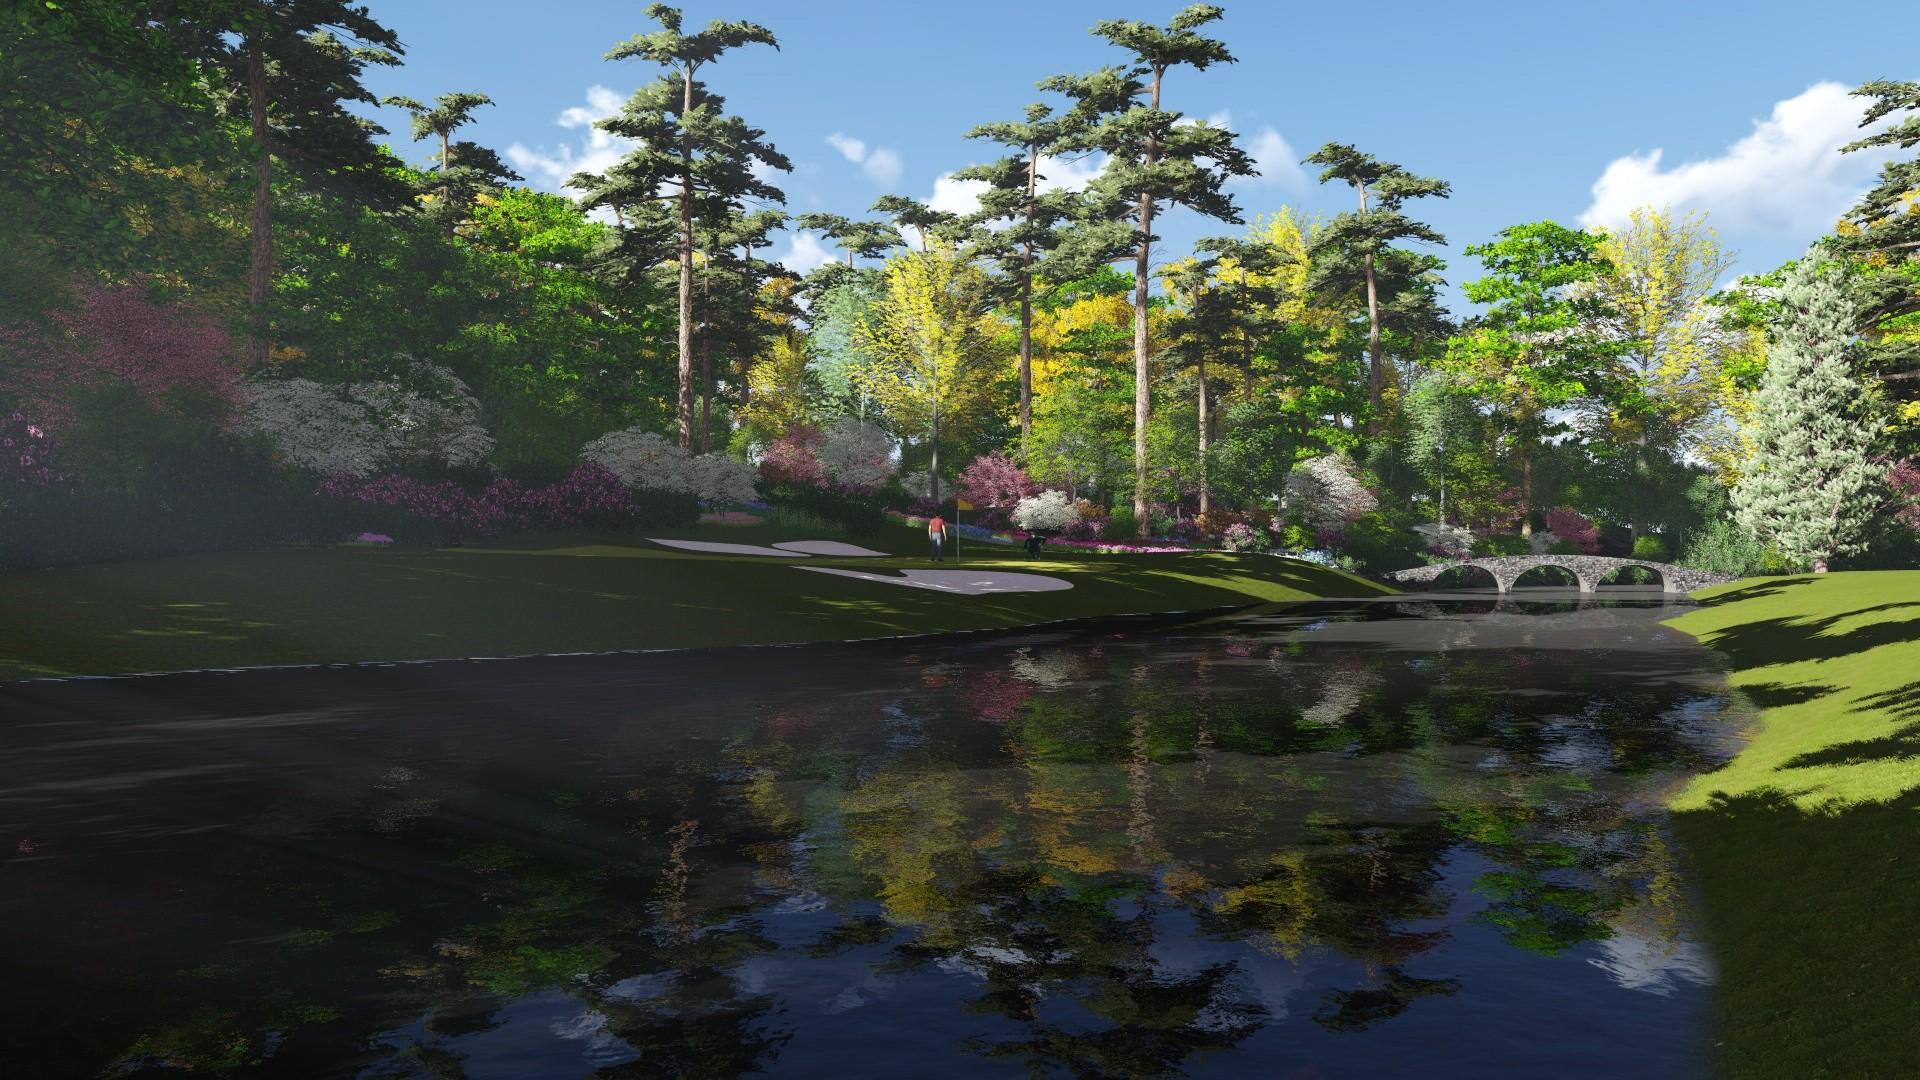 Augusta National GC 006.jpg (920.95 kB, – viewed 359 times.)